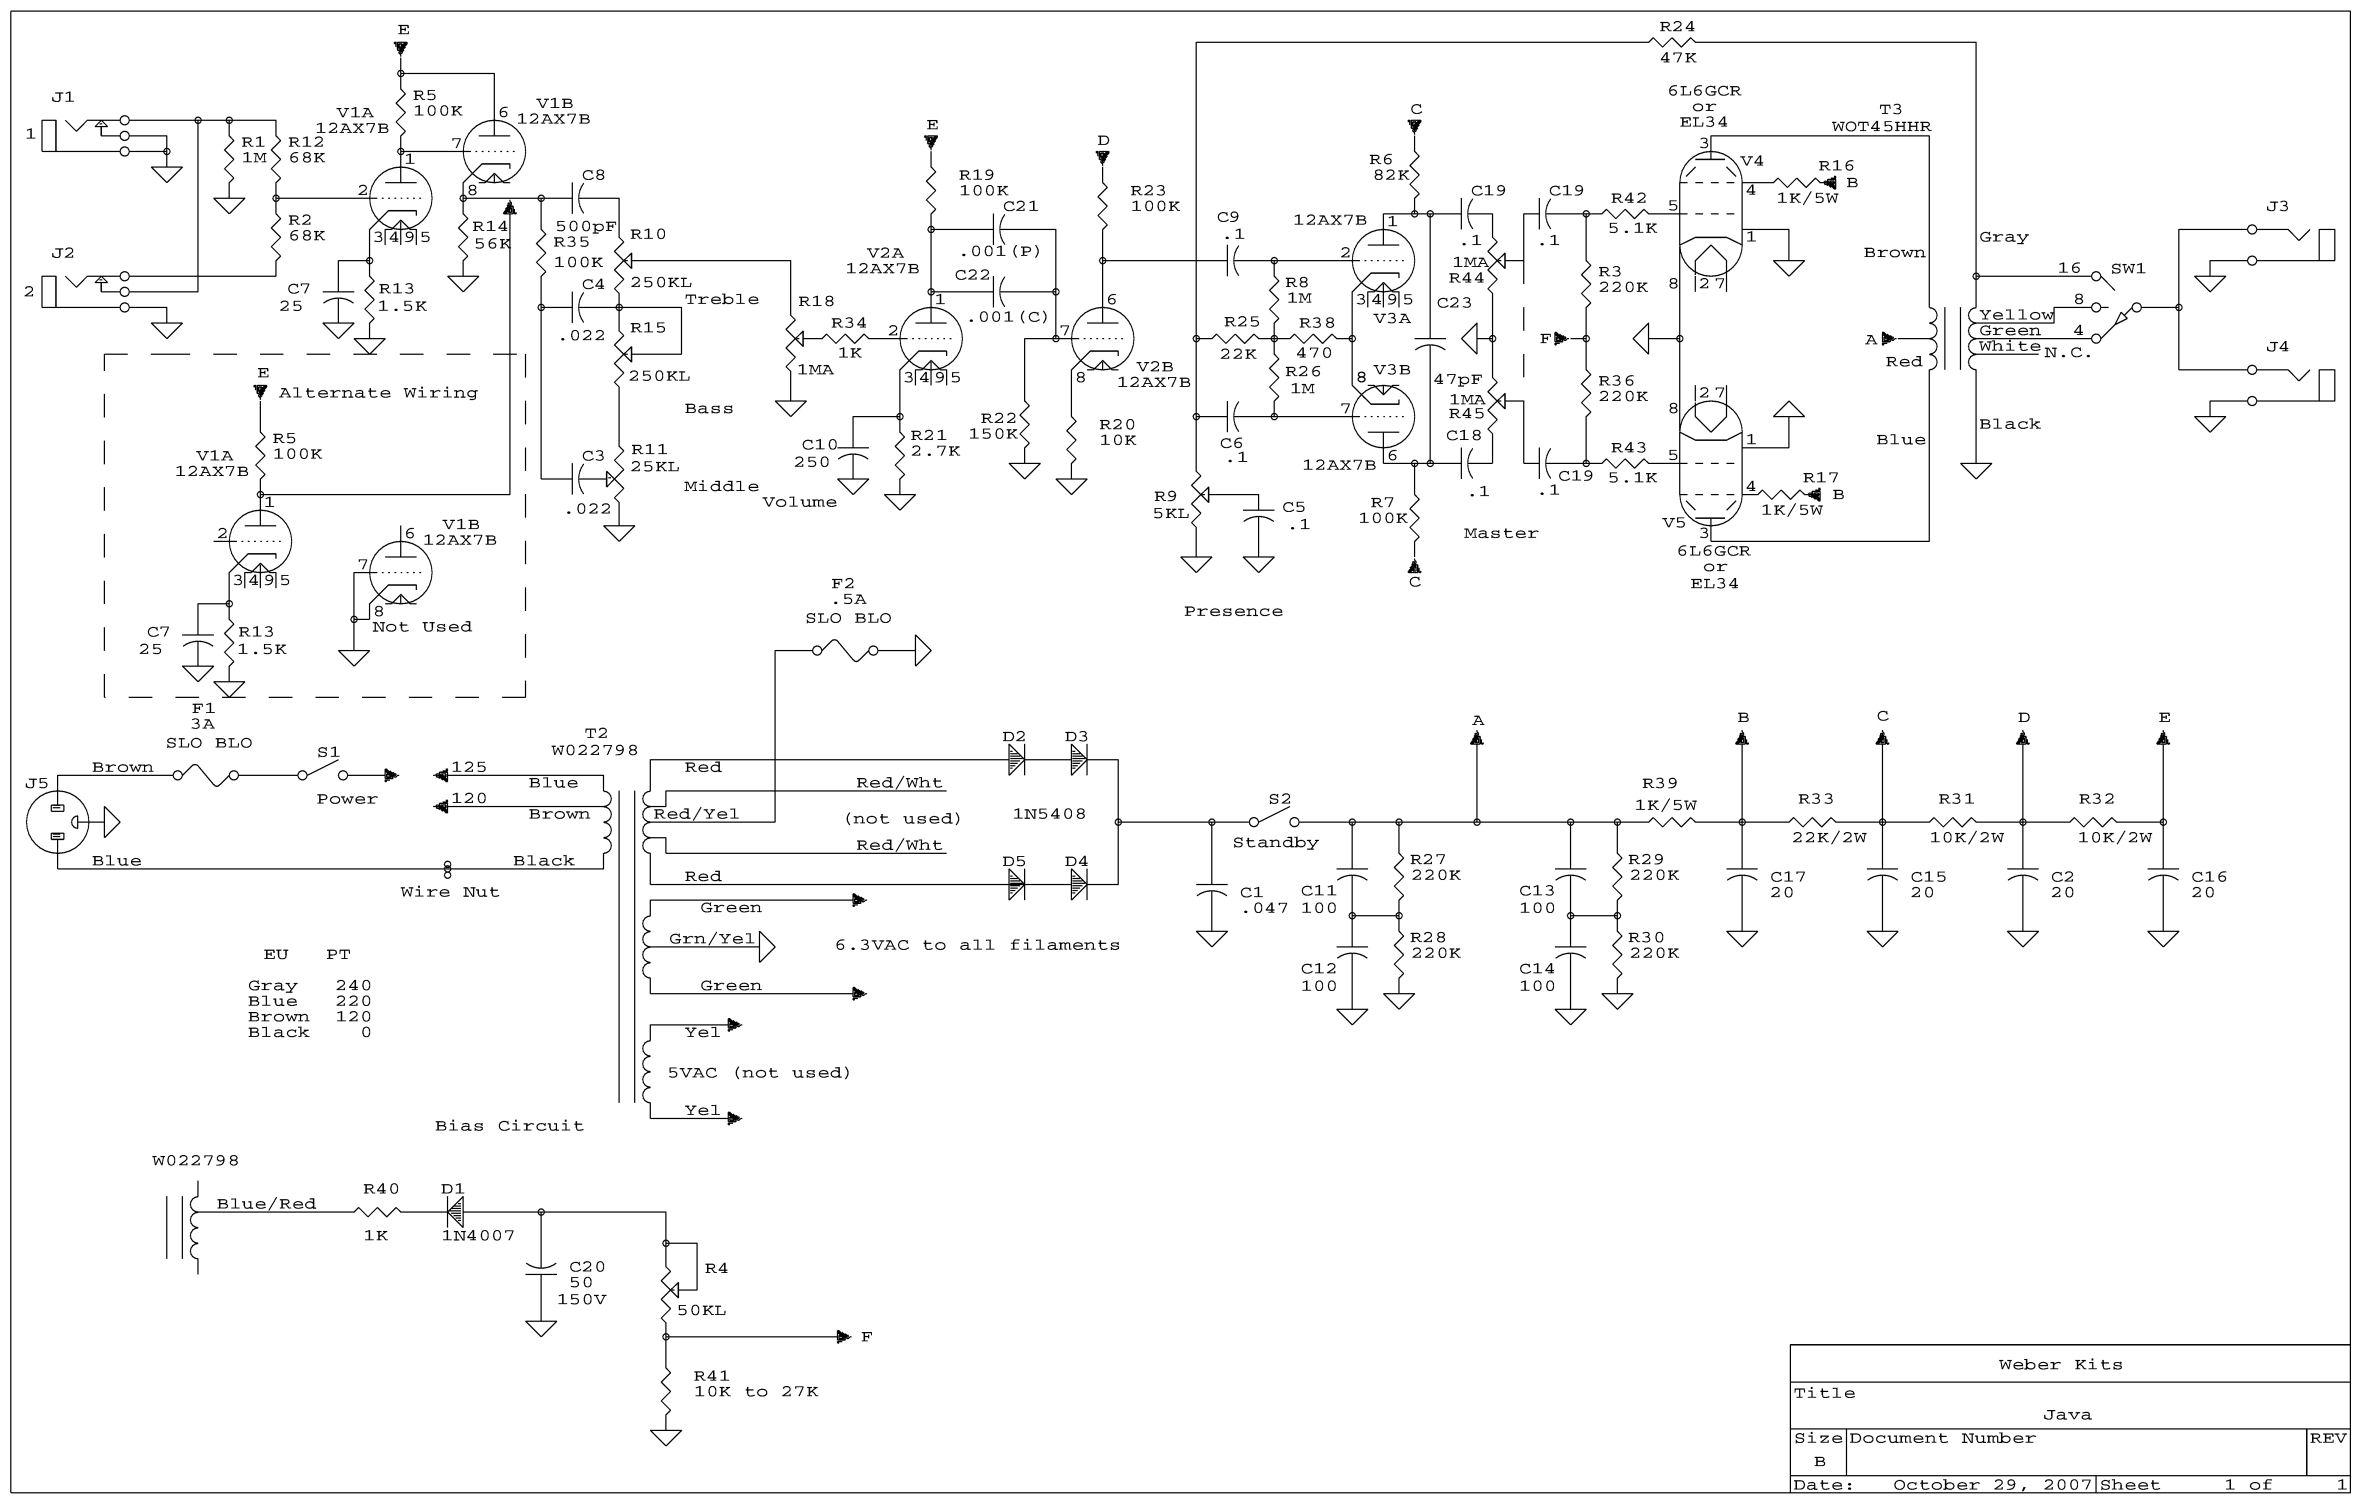 70v speaker wiring diagram fujitsu mini split attenuator schematic, speaker, get free image about